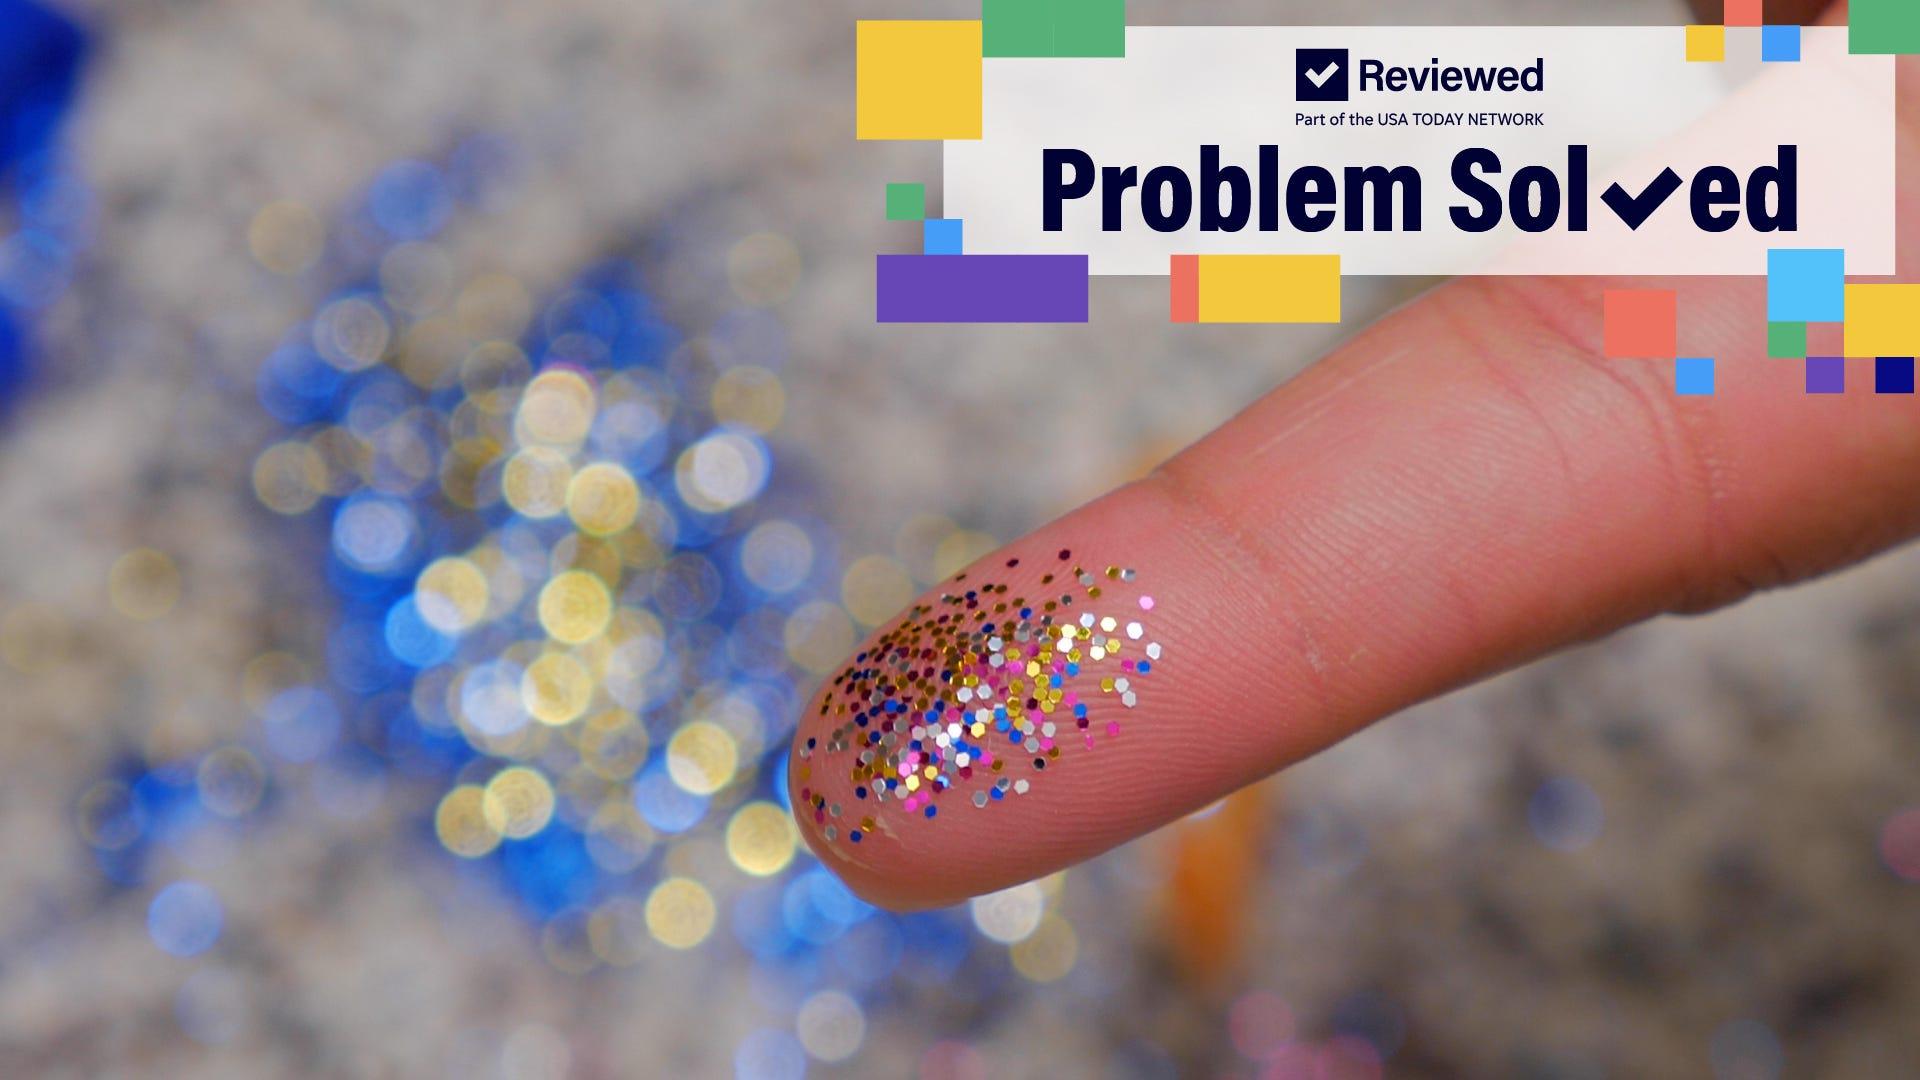 3 easy steps to clean glitter spills